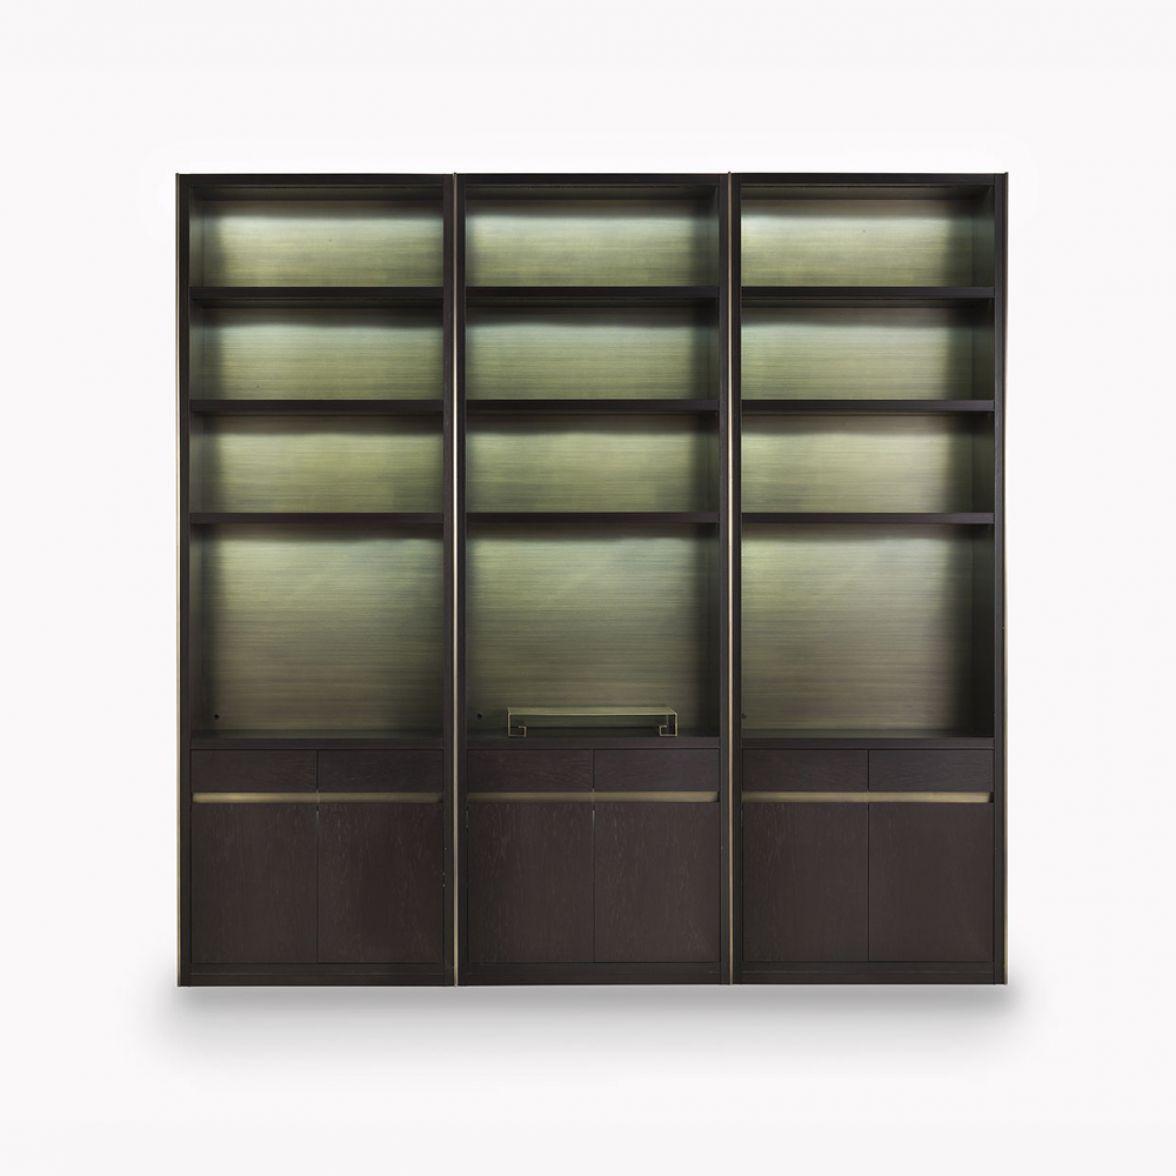 Medea bookcase фото цена